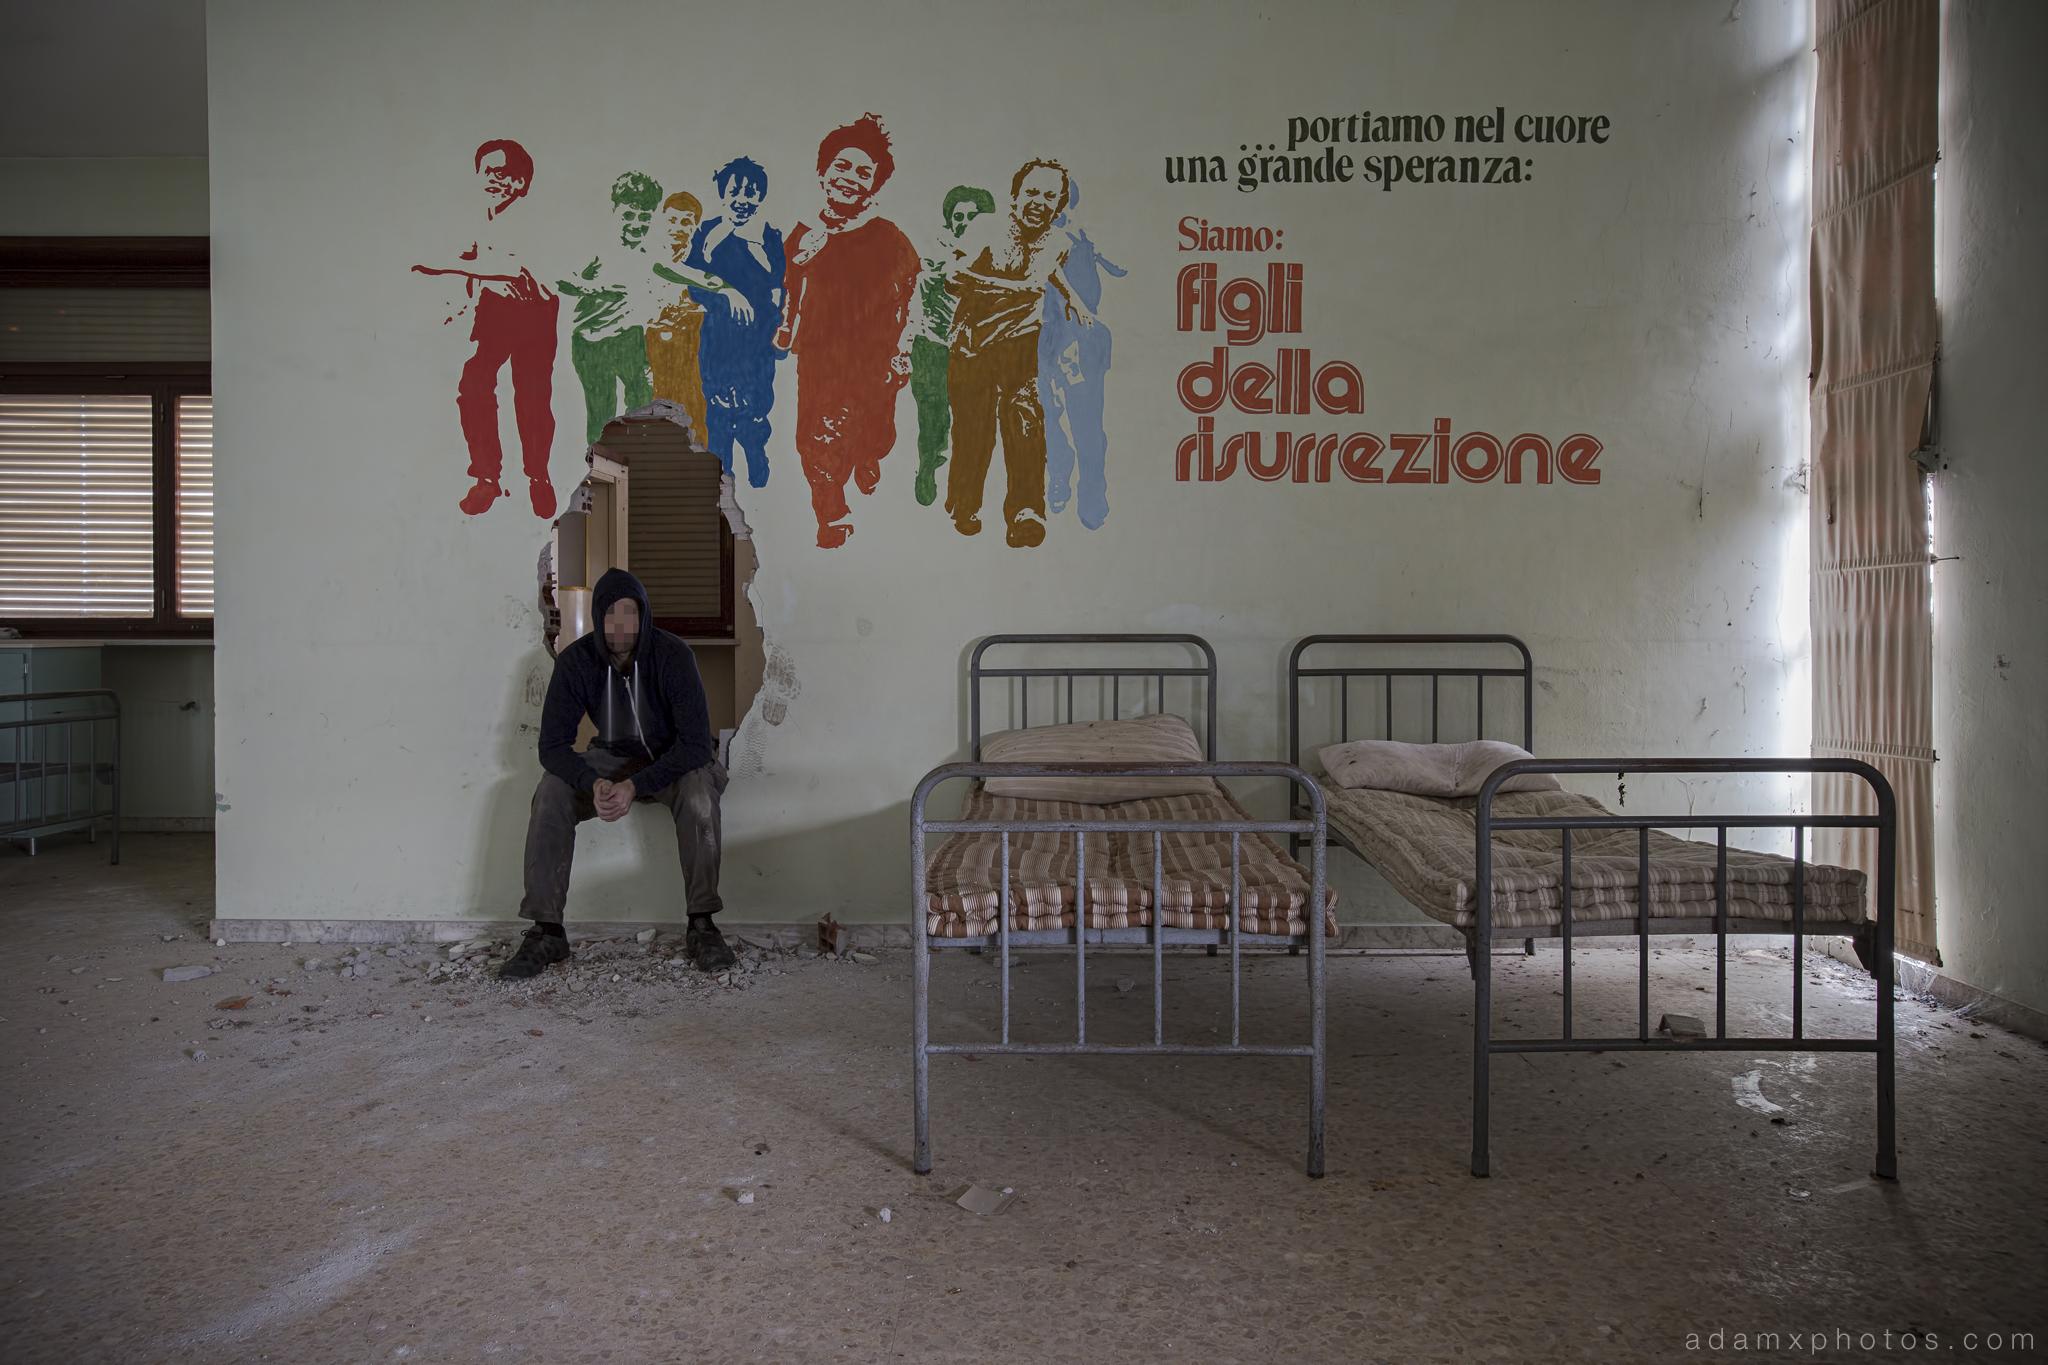 College Eglise Collegio di Musica Saint Evelise School Italy Italia Urbex selfie mural Adam X Urban Exploration photo photos report decay detail UE abandoned derelict unused empty disused decay decayed decaying grimy grime